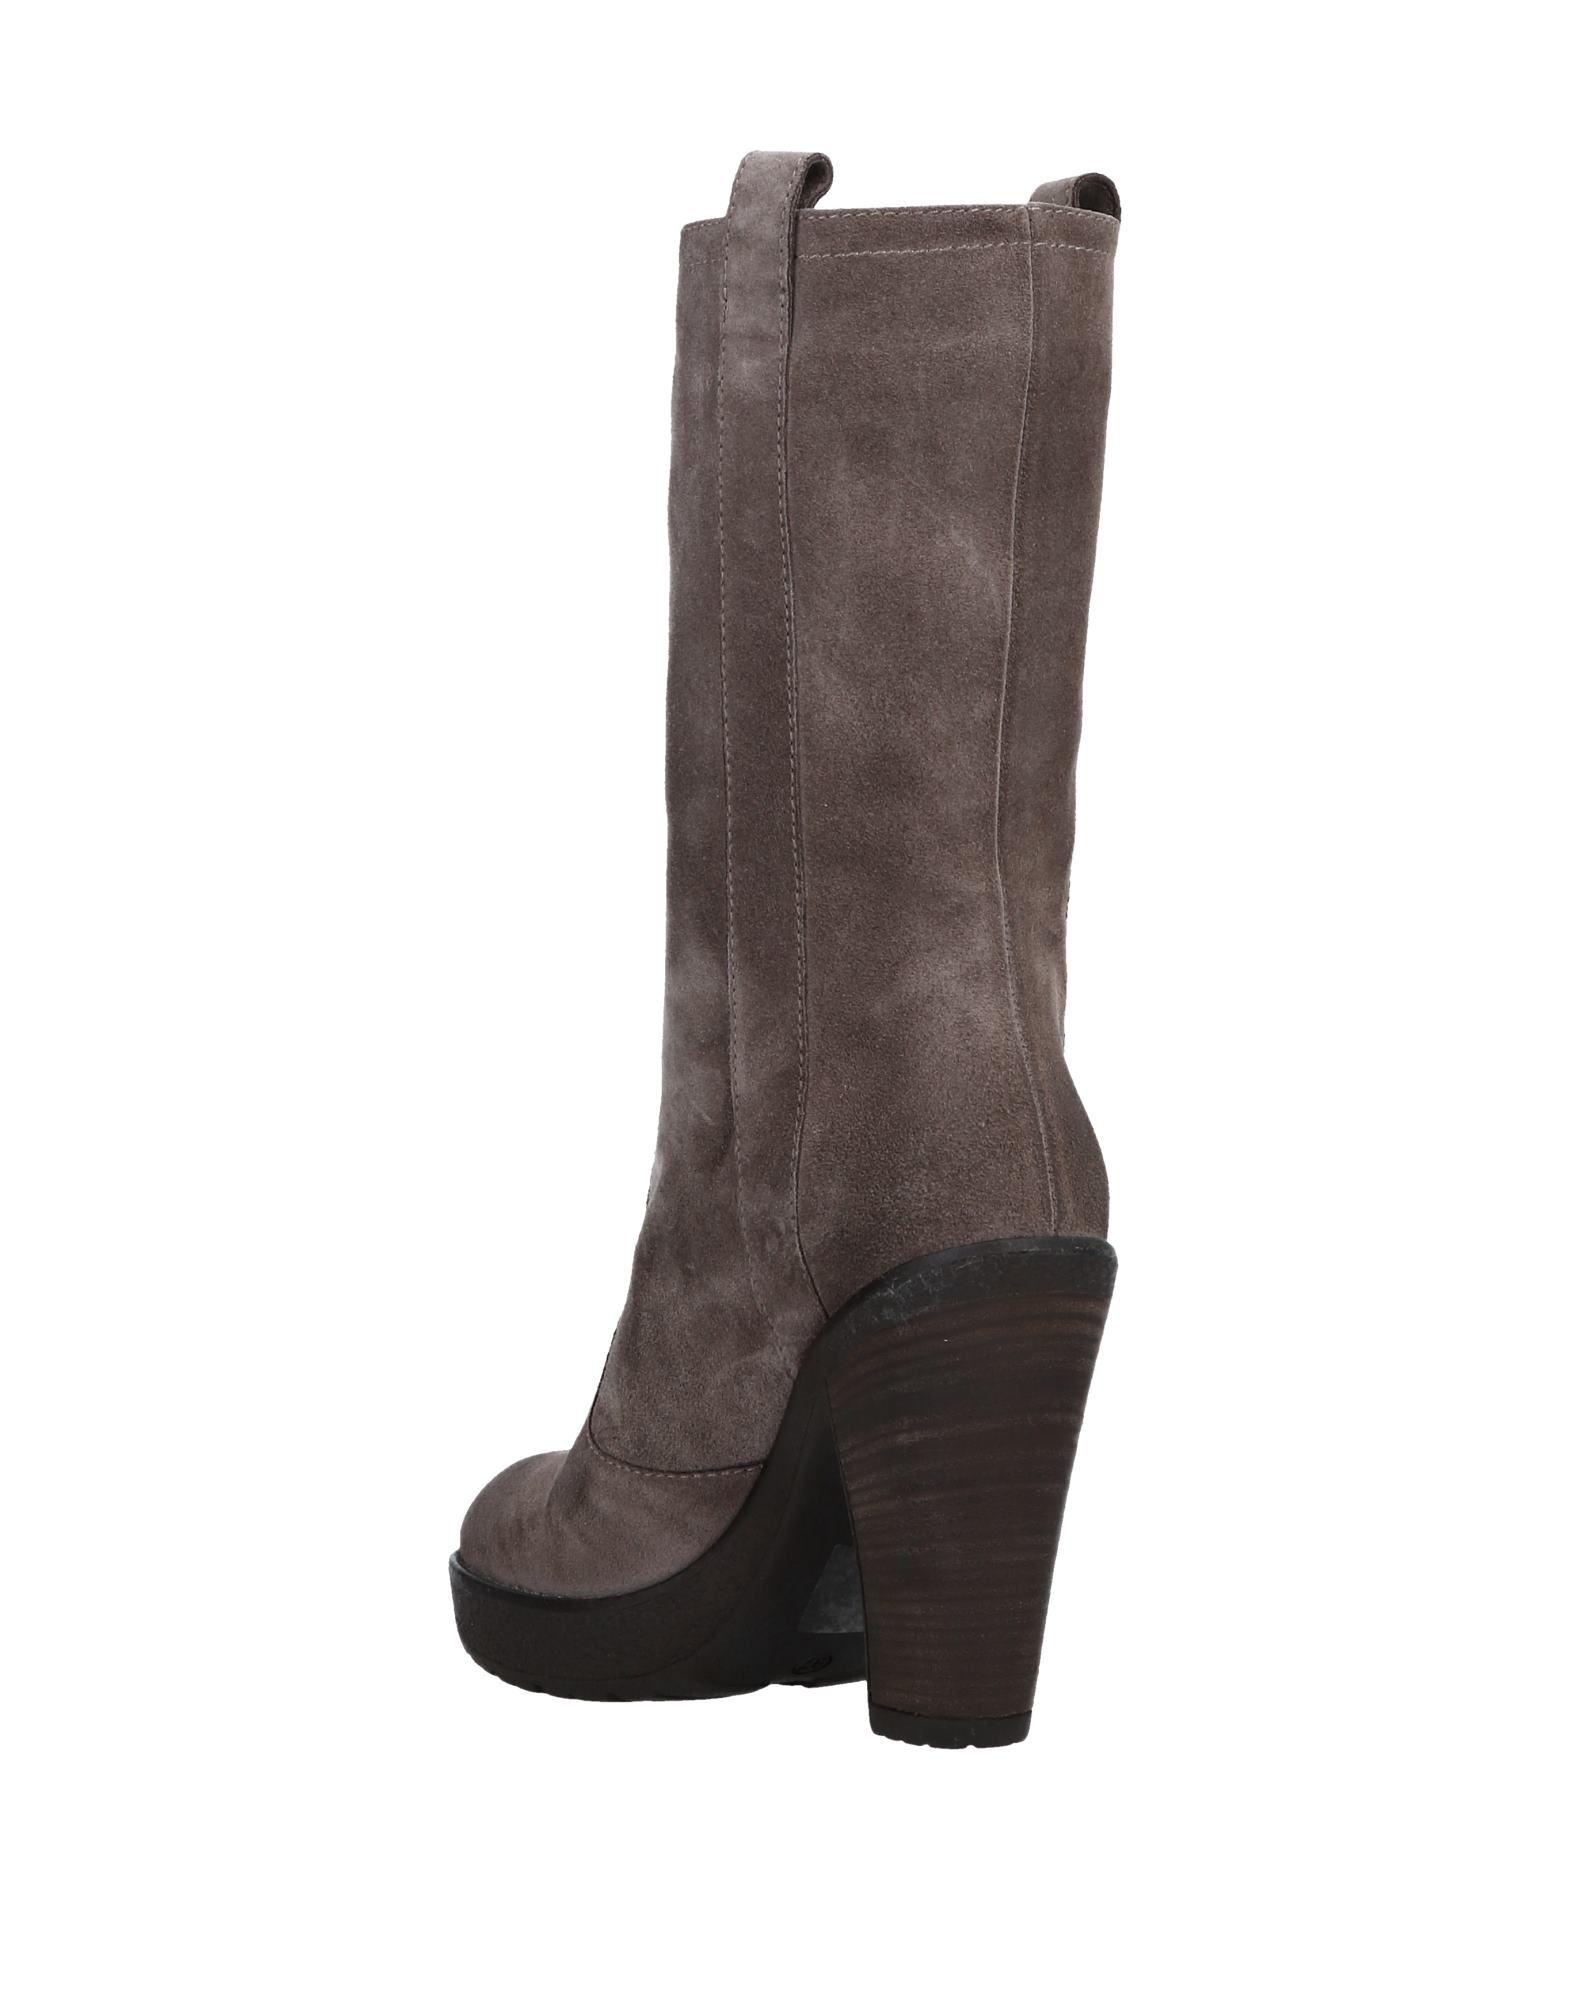 Maria Cristina Damen Stiefelette Damen Cristina  11520128JO Neue Schuhe 72e7c4